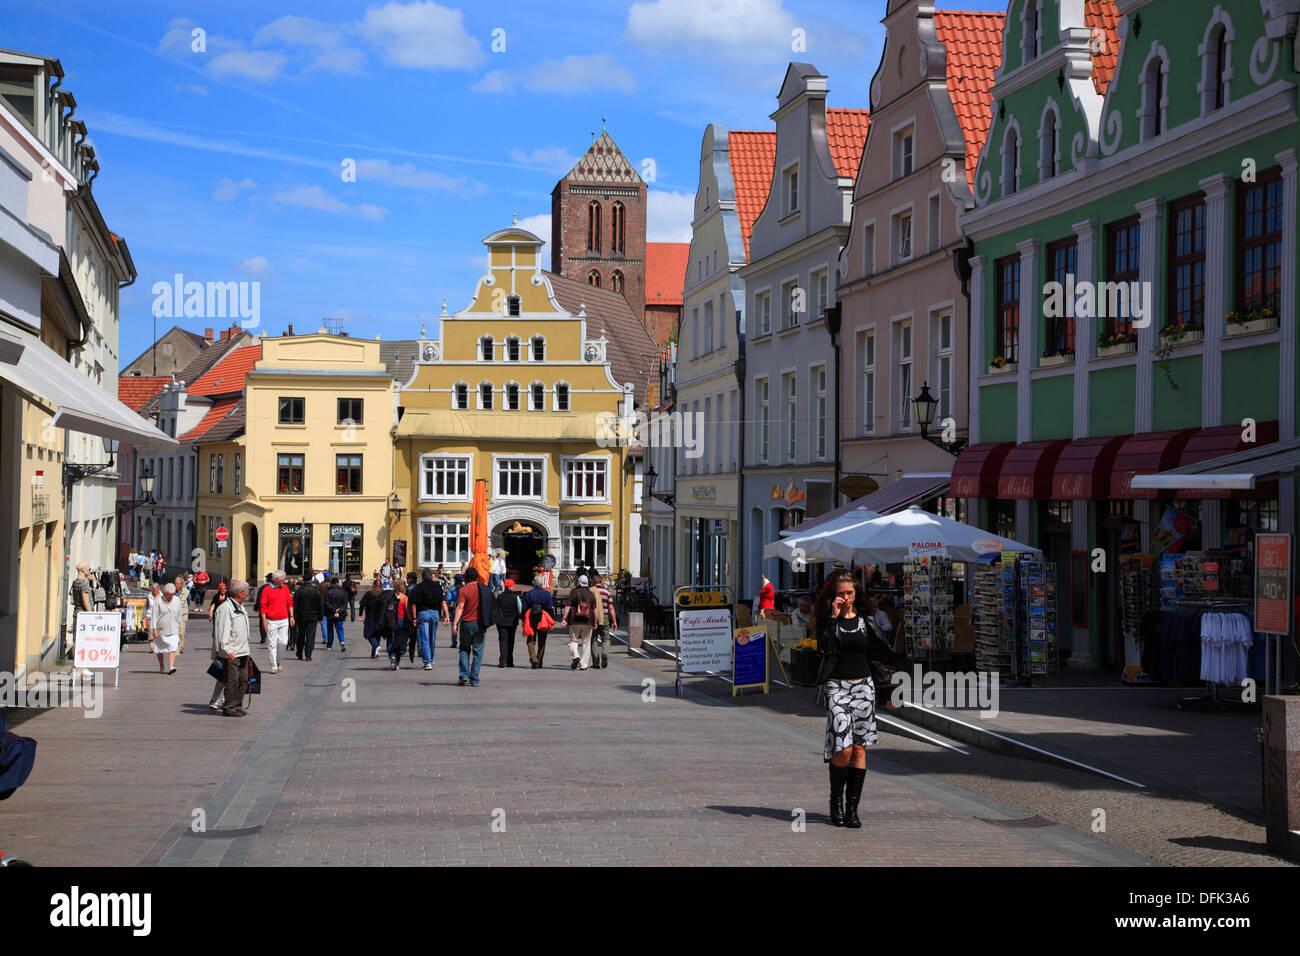 KRAEMERSTRASSE, Wismar, Baltic Sea, Mecklenburg West Pomerania, Germany Stock Photo